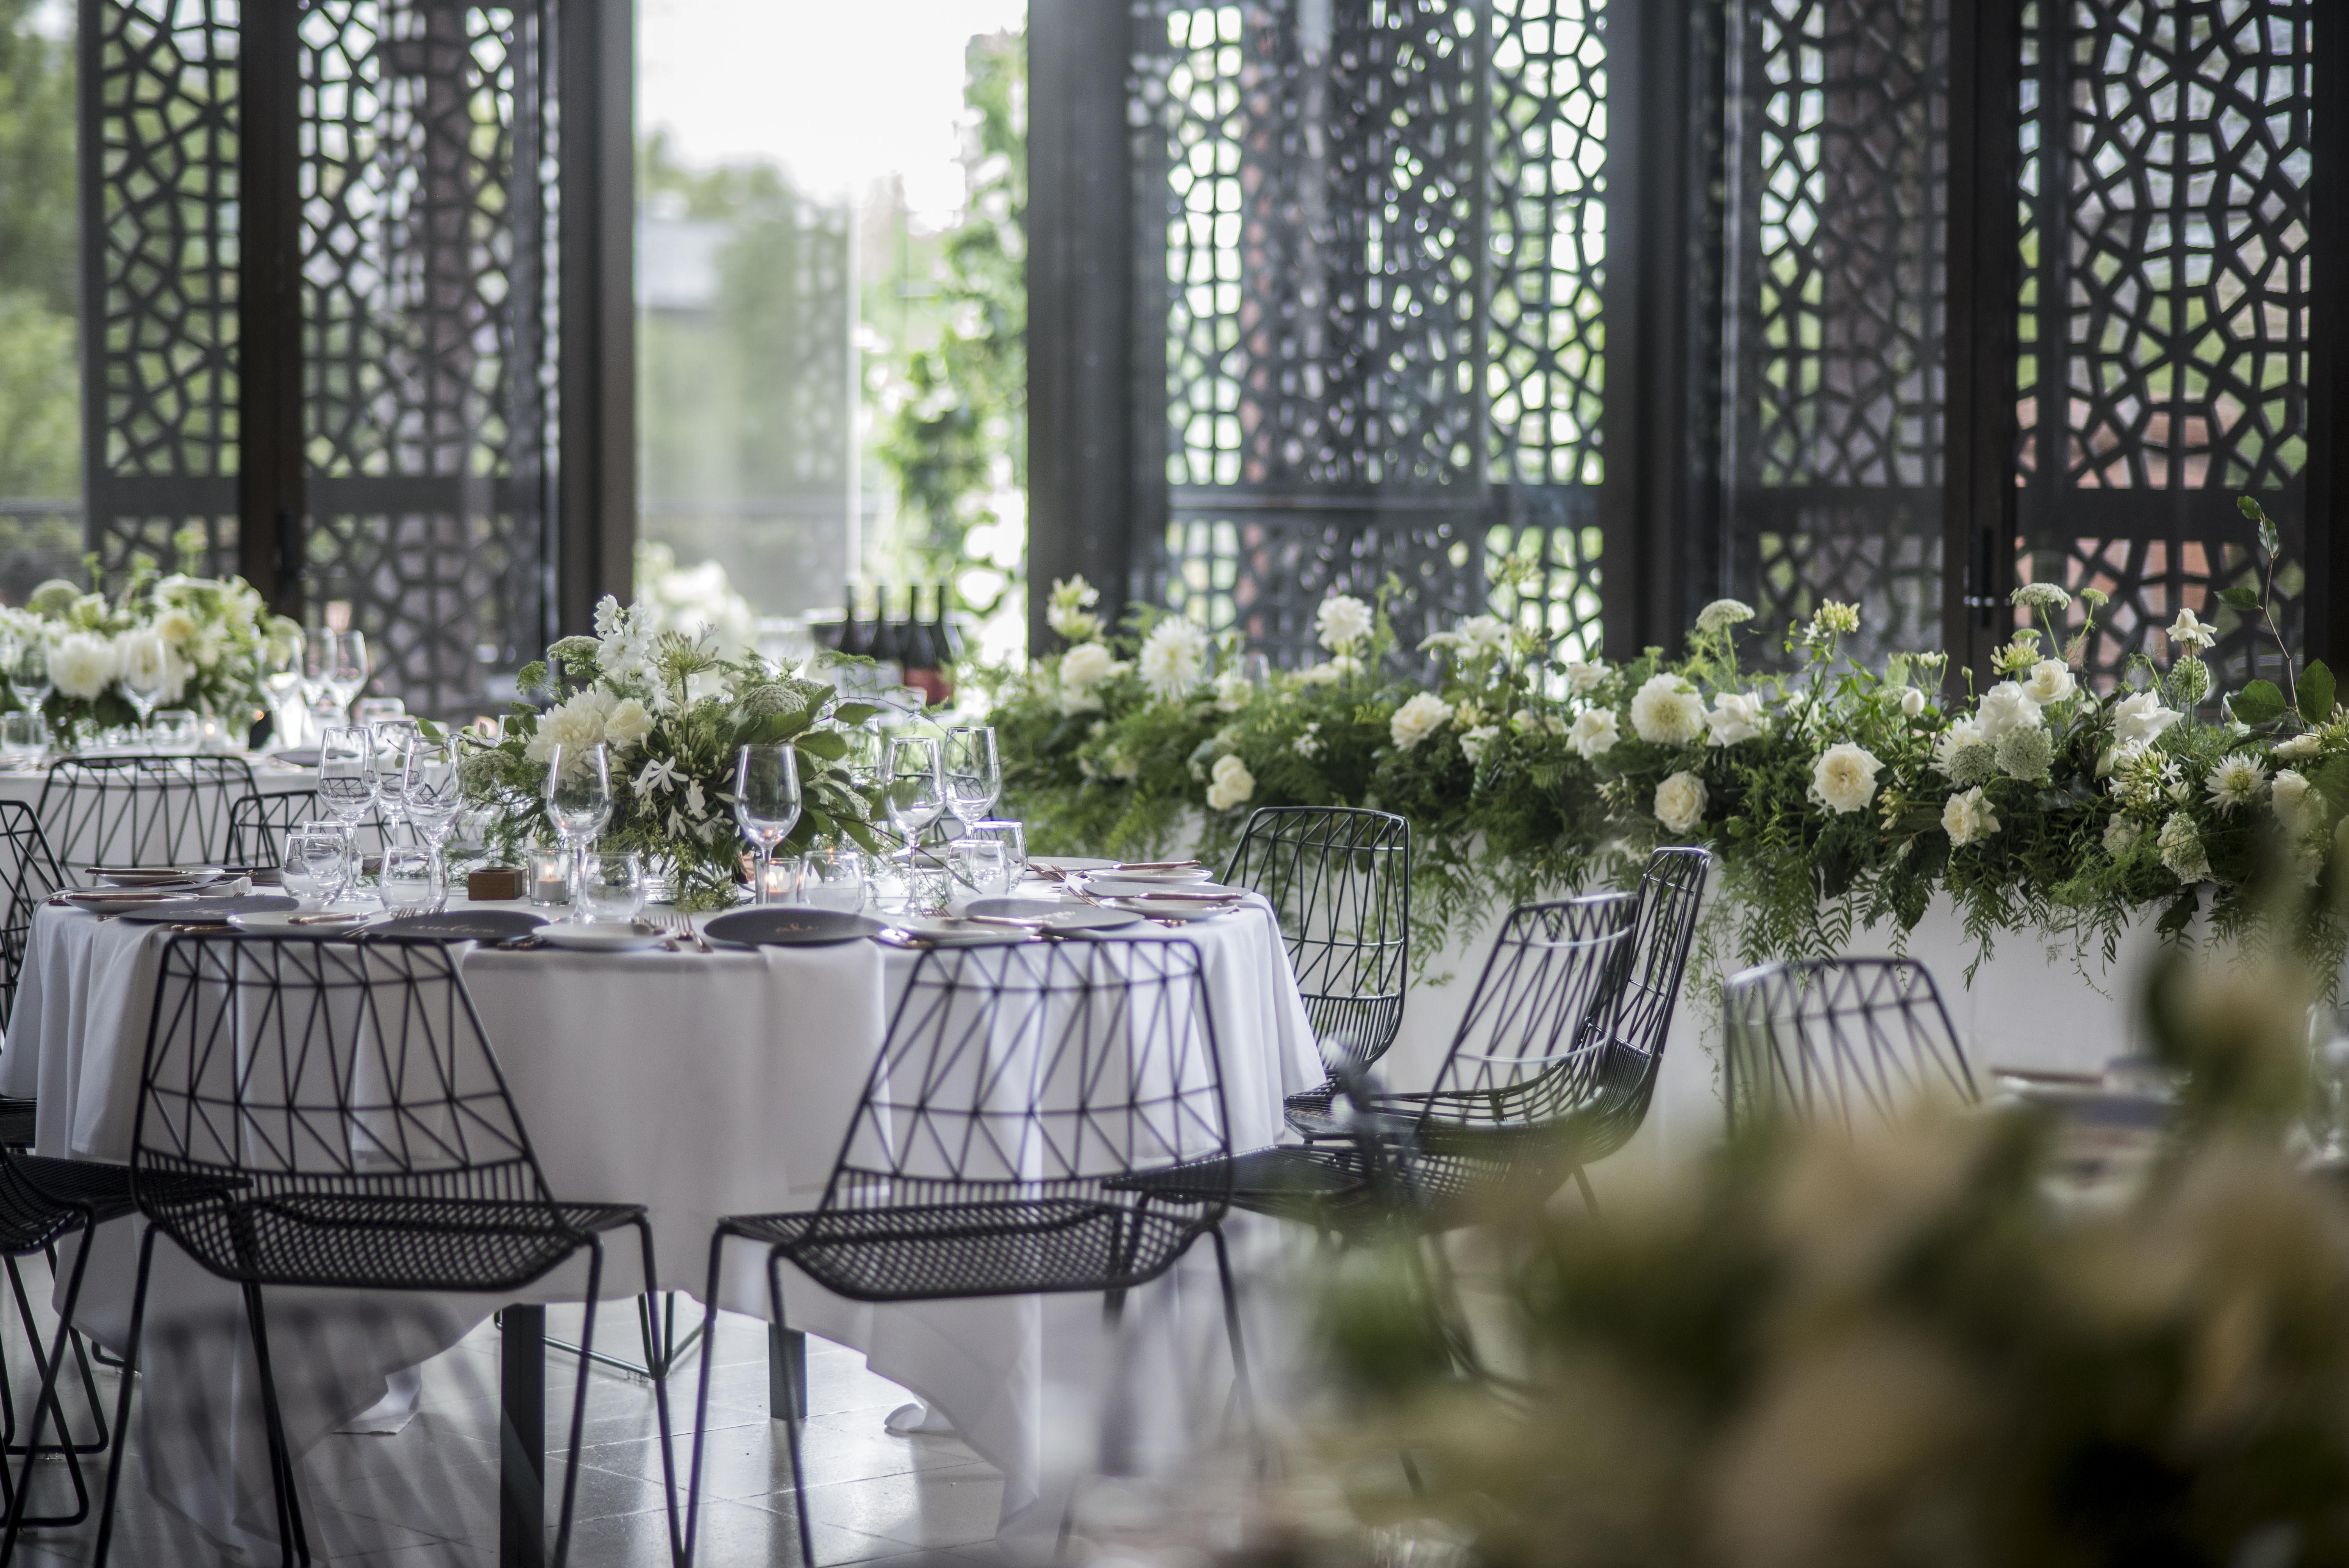 Lush & wild bridal table garland